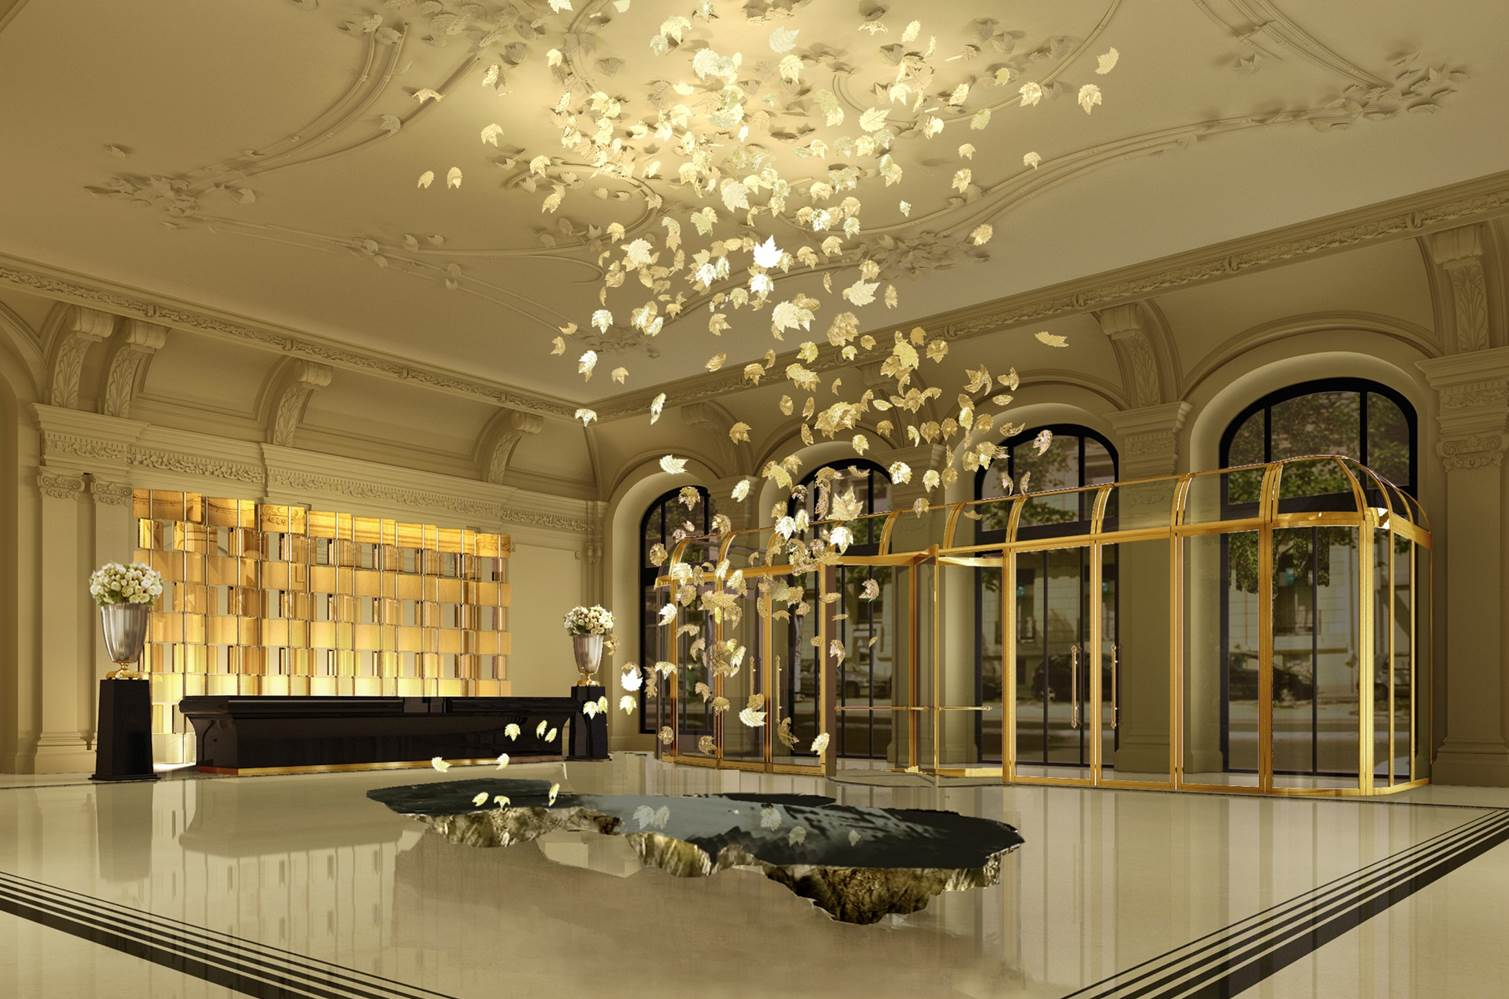 l 39 h tel peninsula paris recrute son chef barman emploi chr petites annonces infosbar. Black Bedroom Furniture Sets. Home Design Ideas